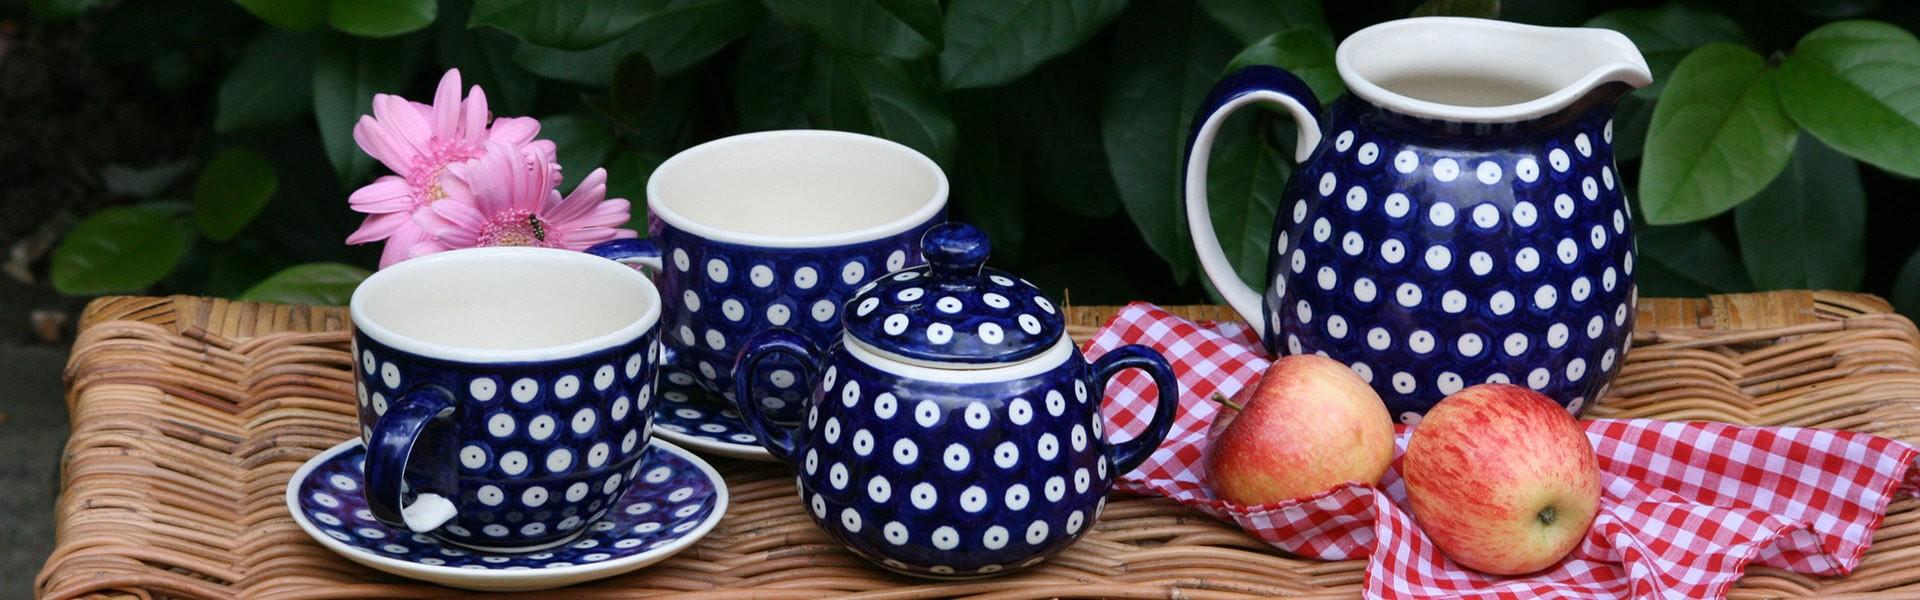 Art Polish Pottery - Farmhouse Kitchen Accessories